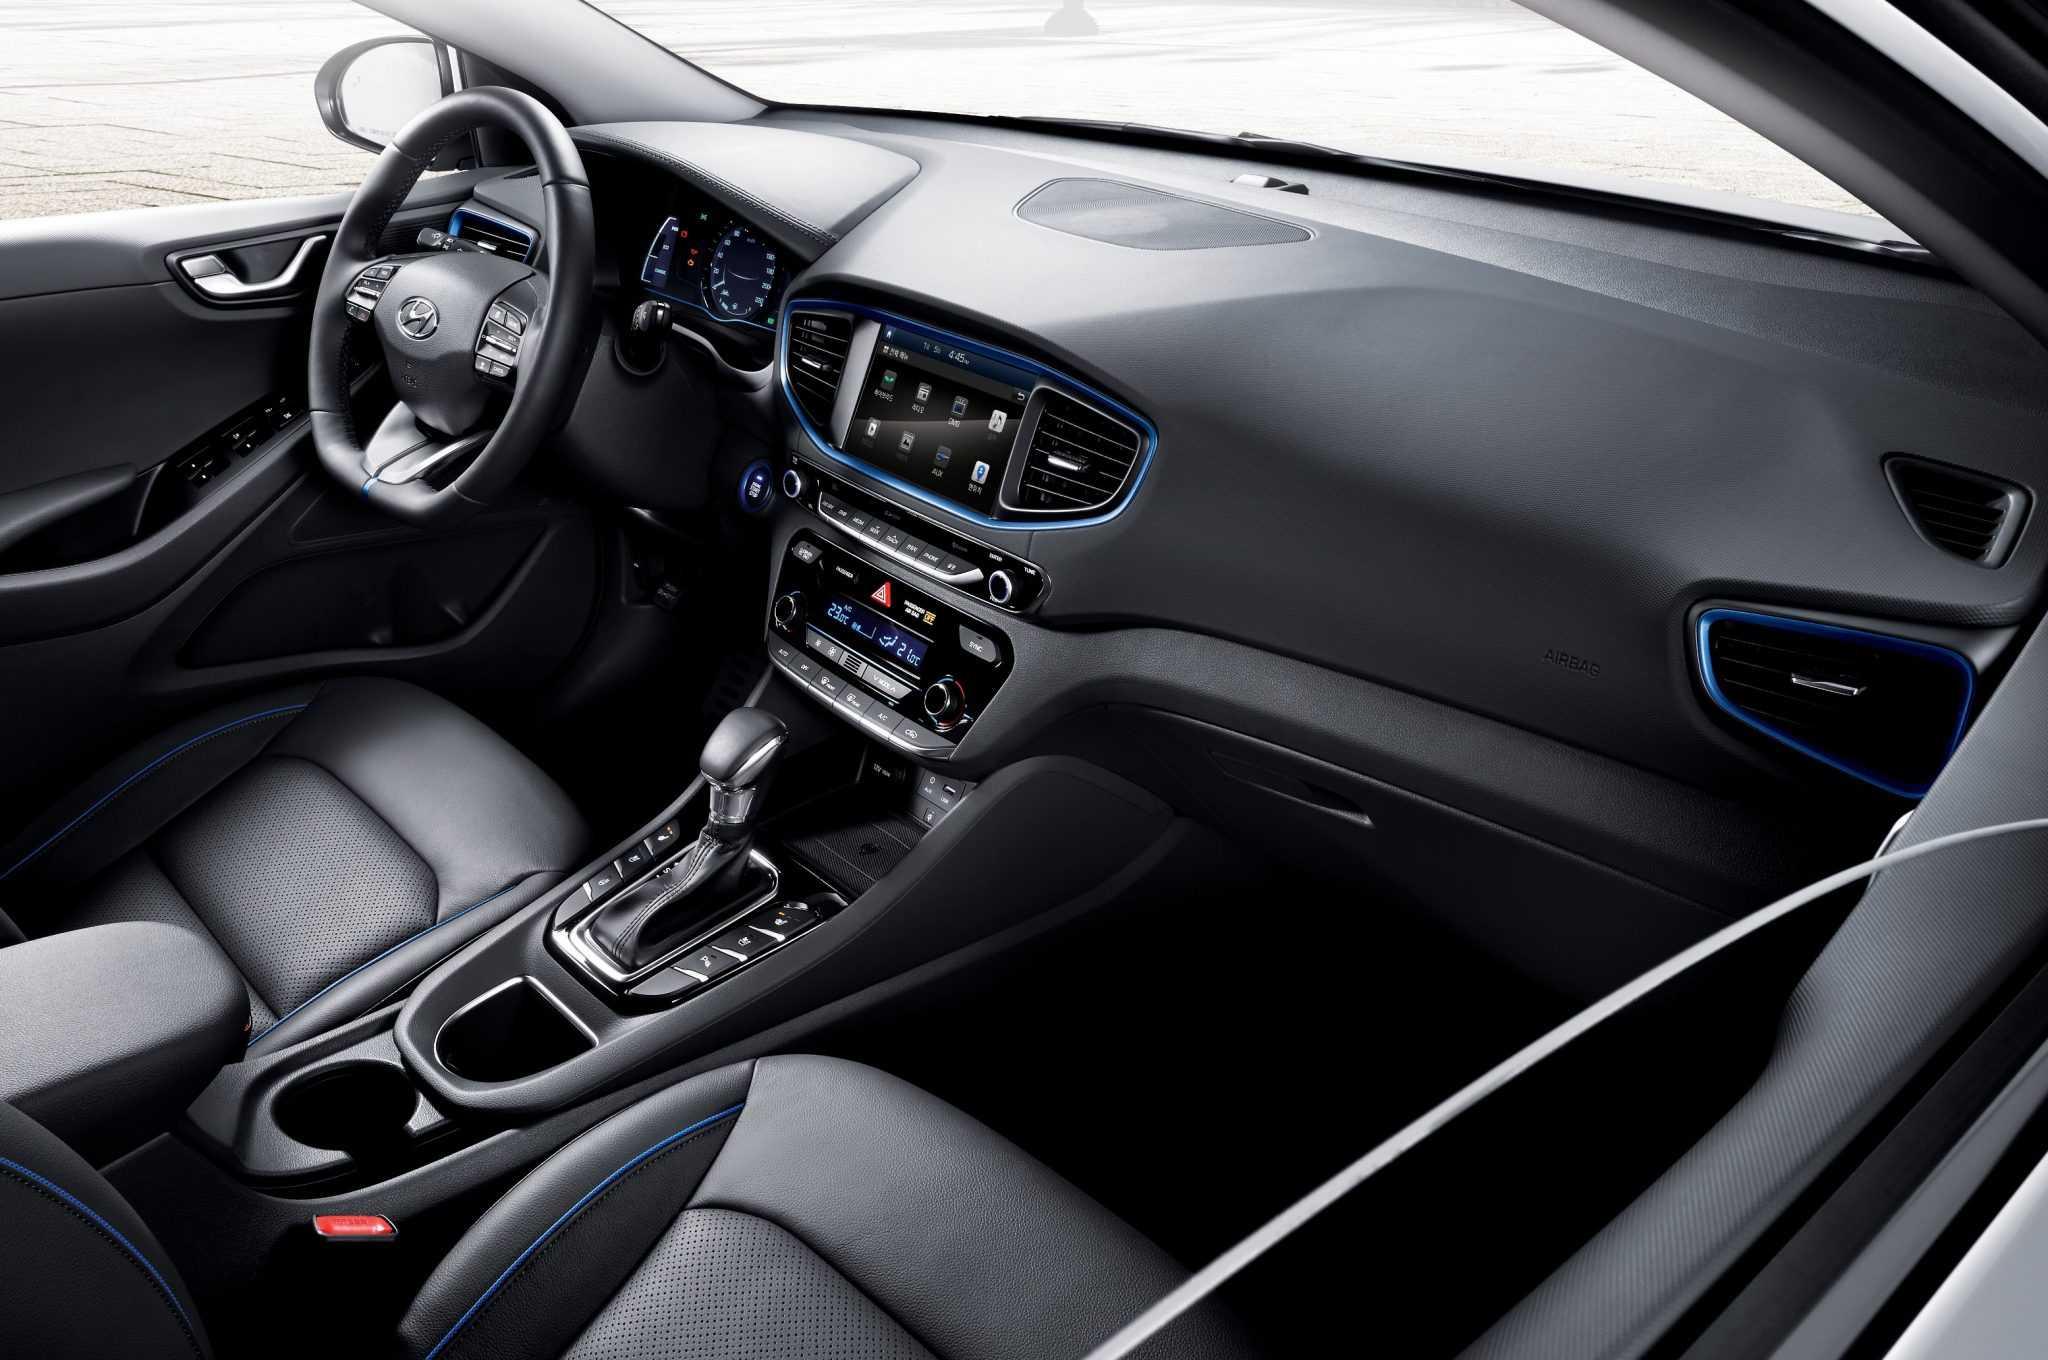 Hyundai Ioniq Hybrid Powetrain Details is Officially Released